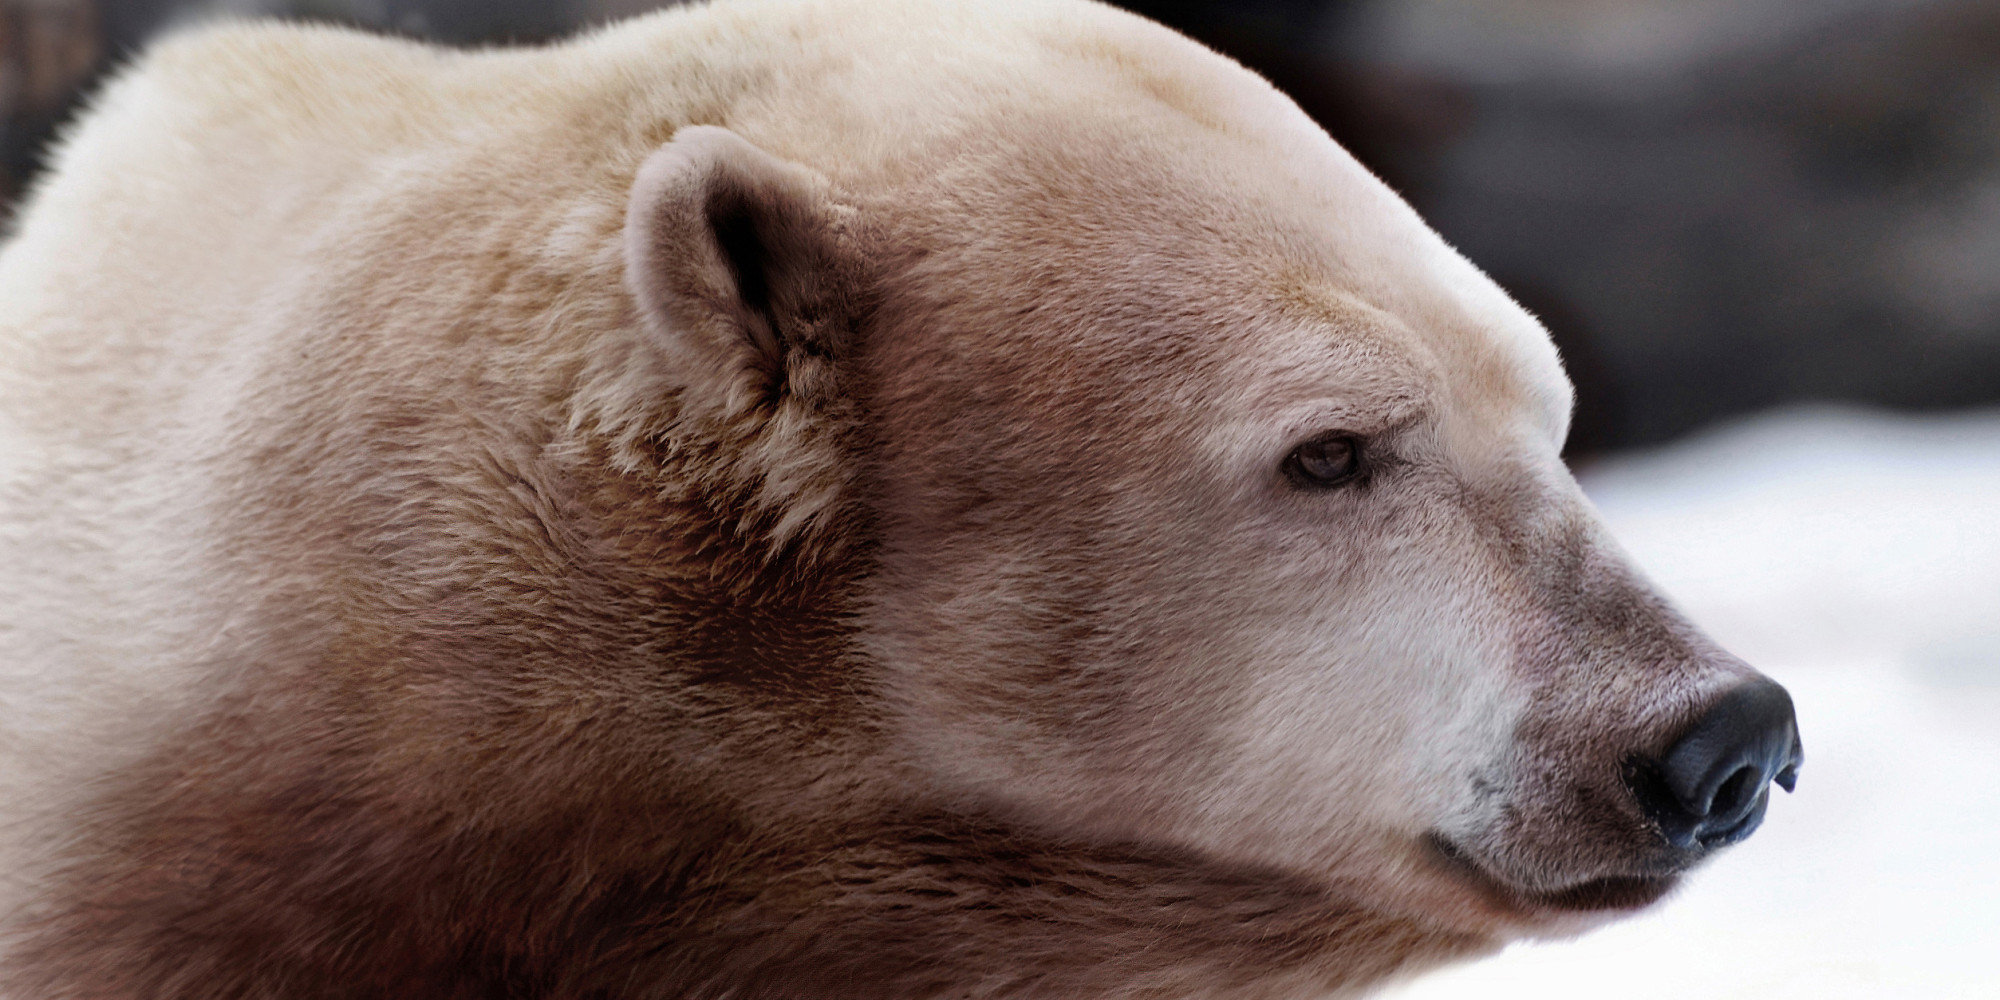 Grolar bear - photo#15